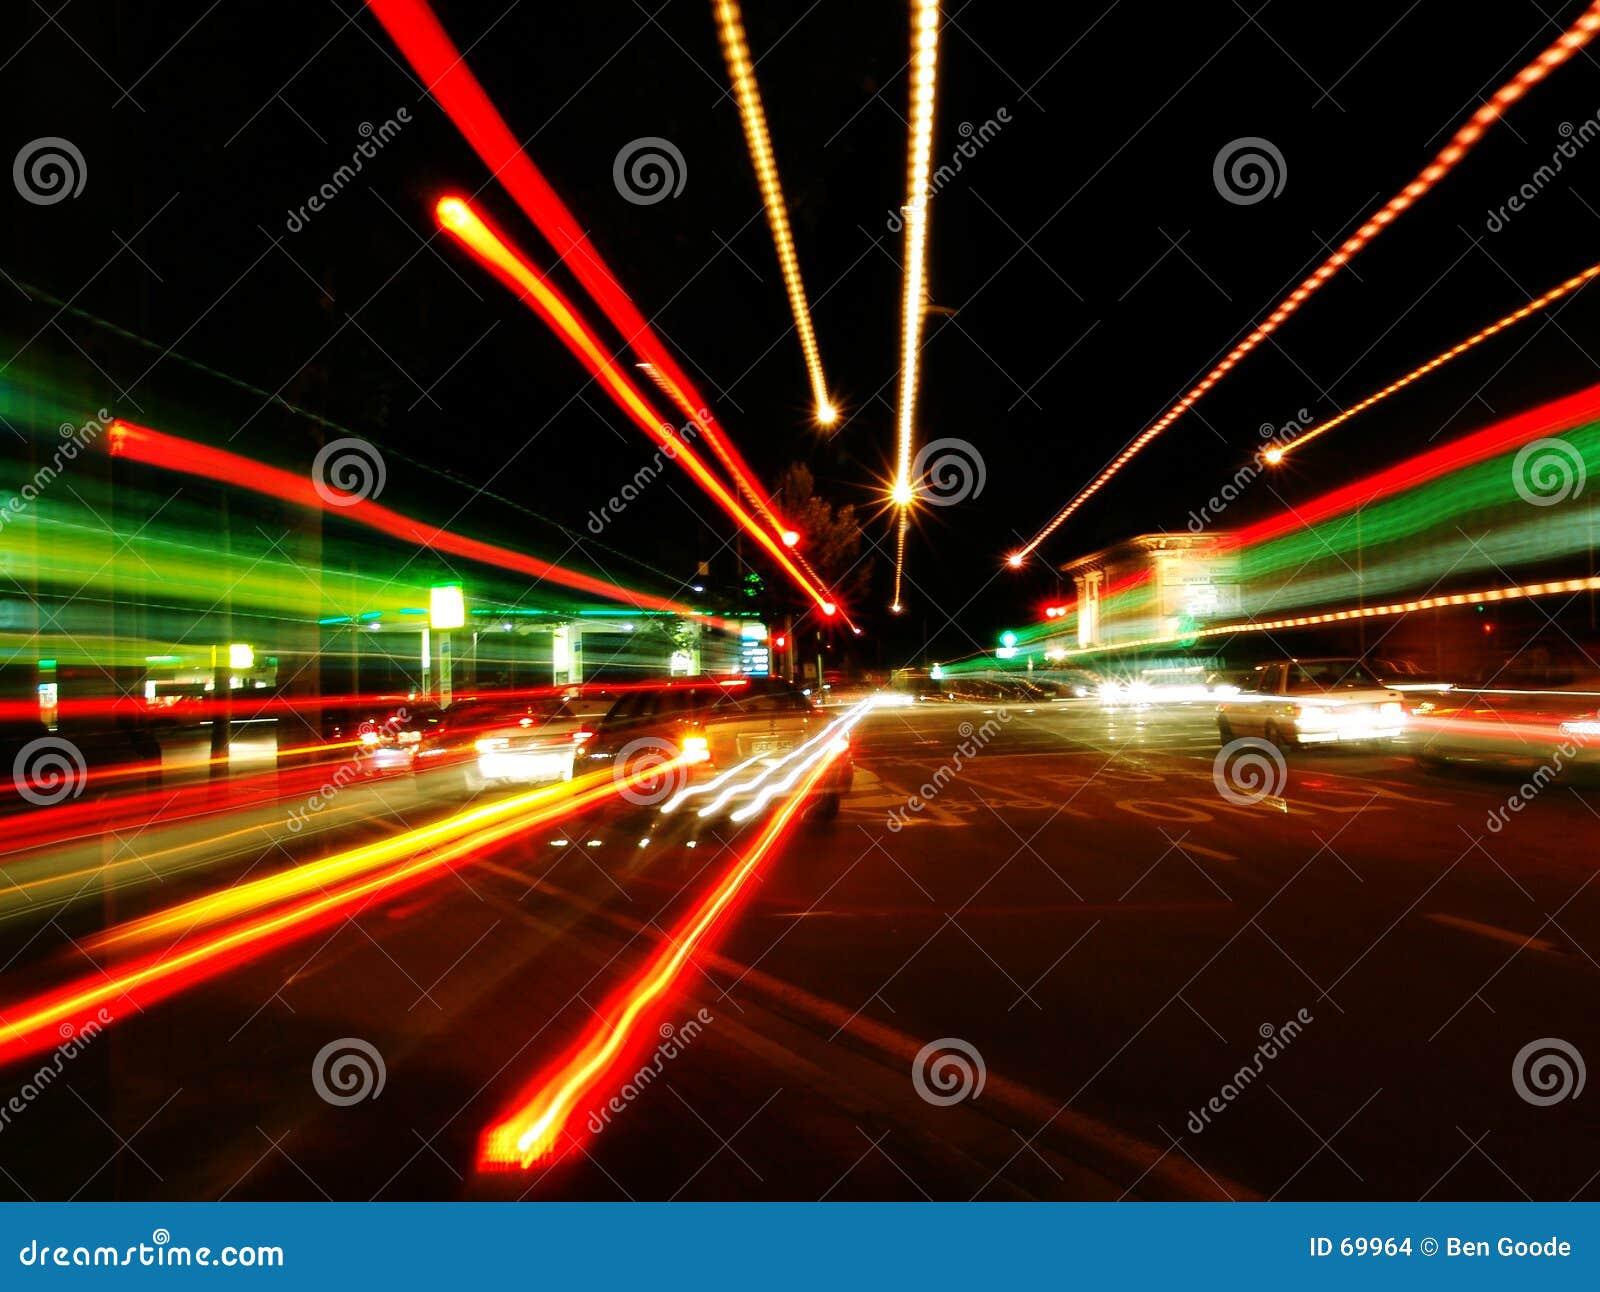 Blur street